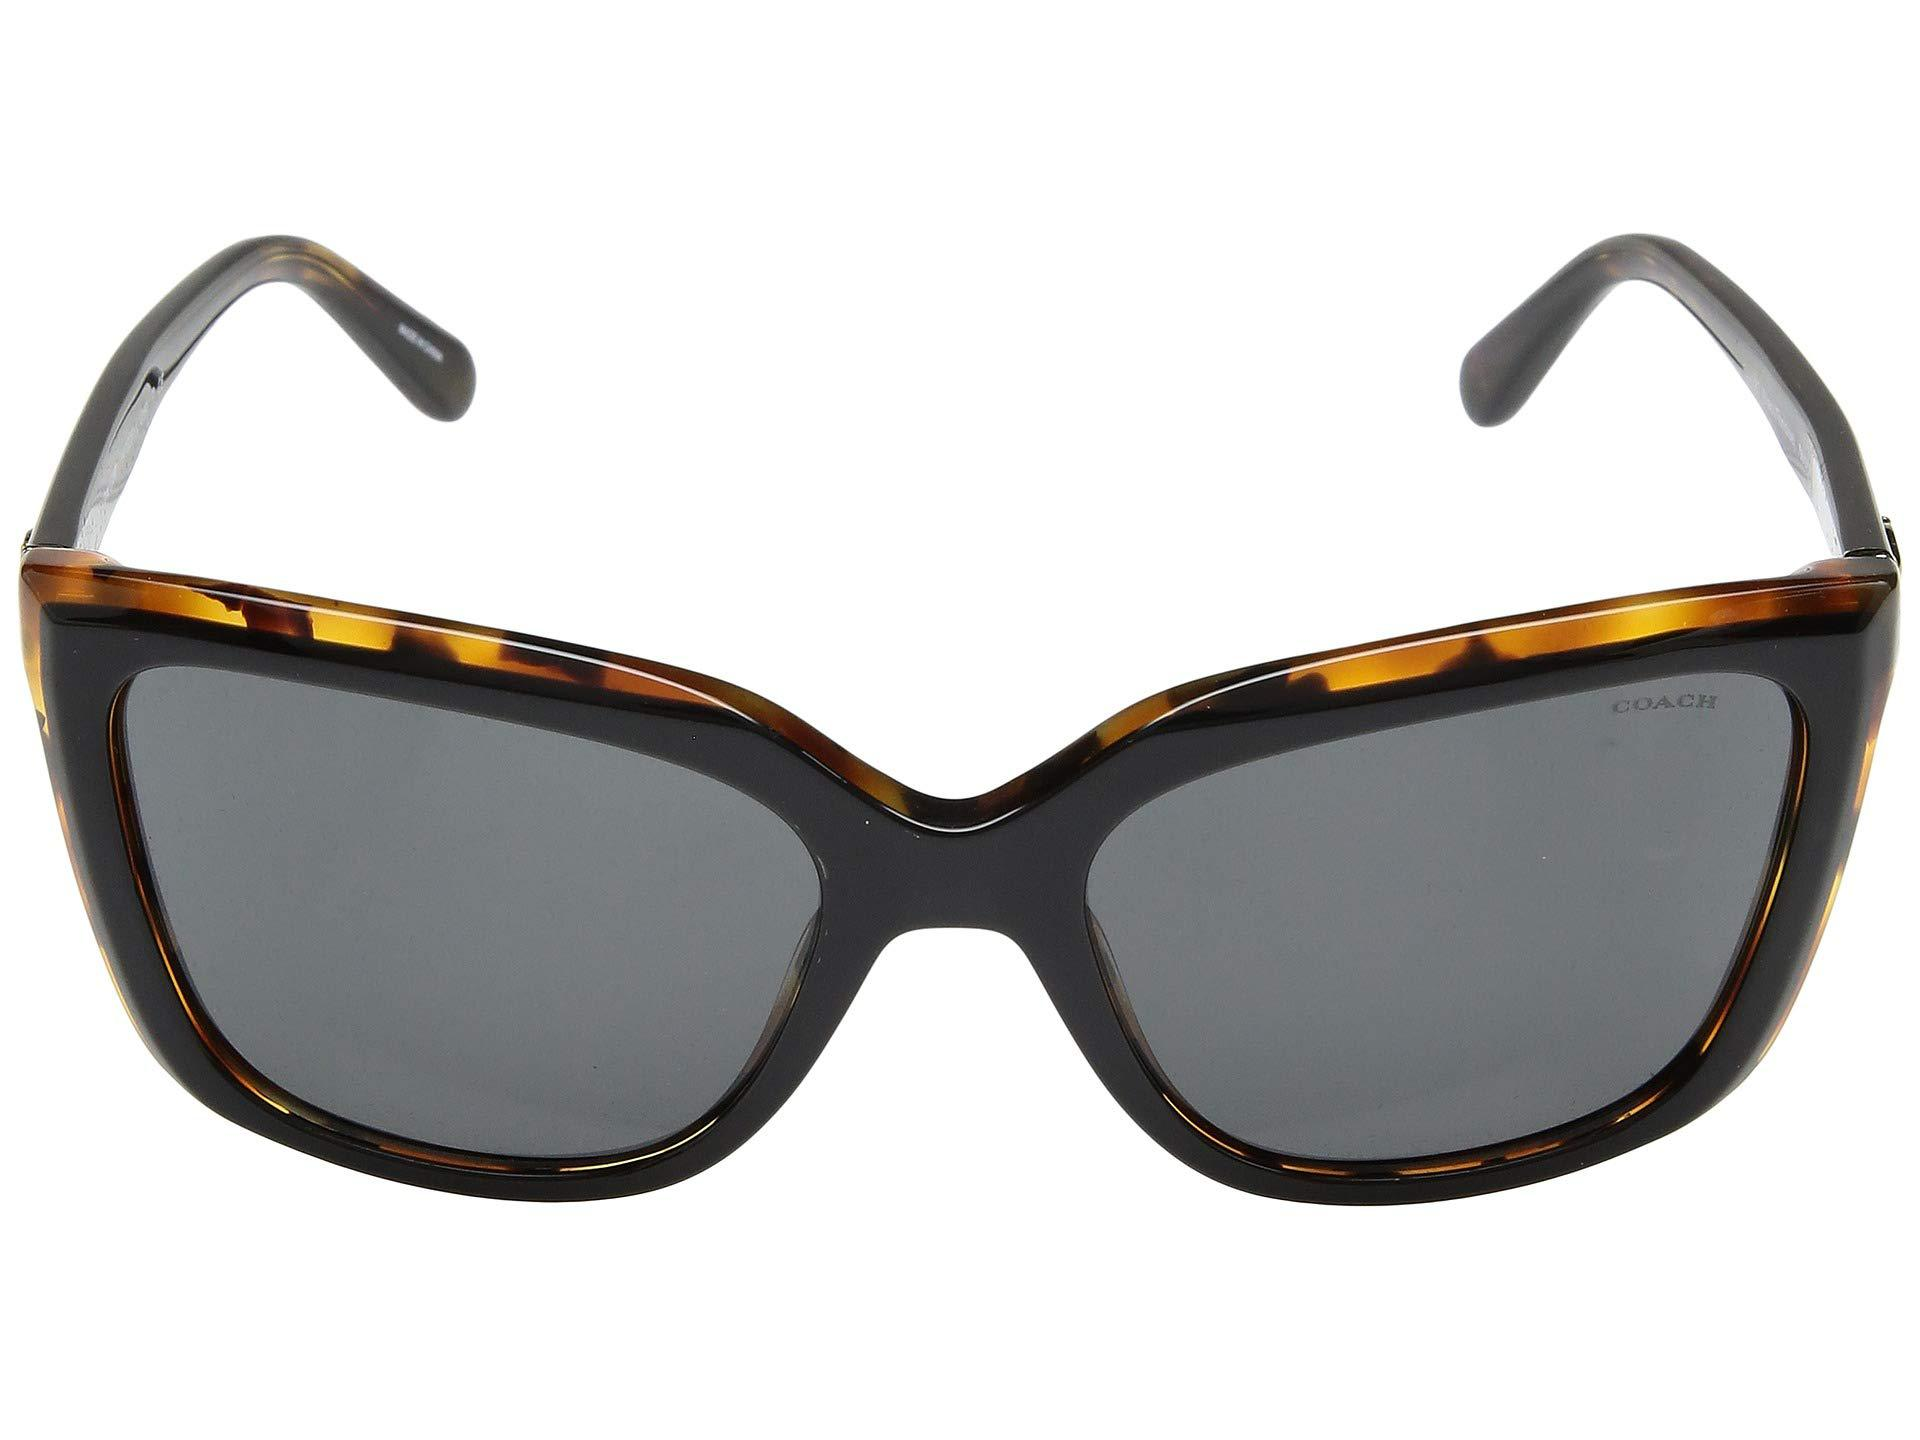 63b1427fd047 COACH - 0hc8261 56mm (black Tortoise/dark Gray Solid) Fashion Sunglasses -  Lyst. View fullscreen